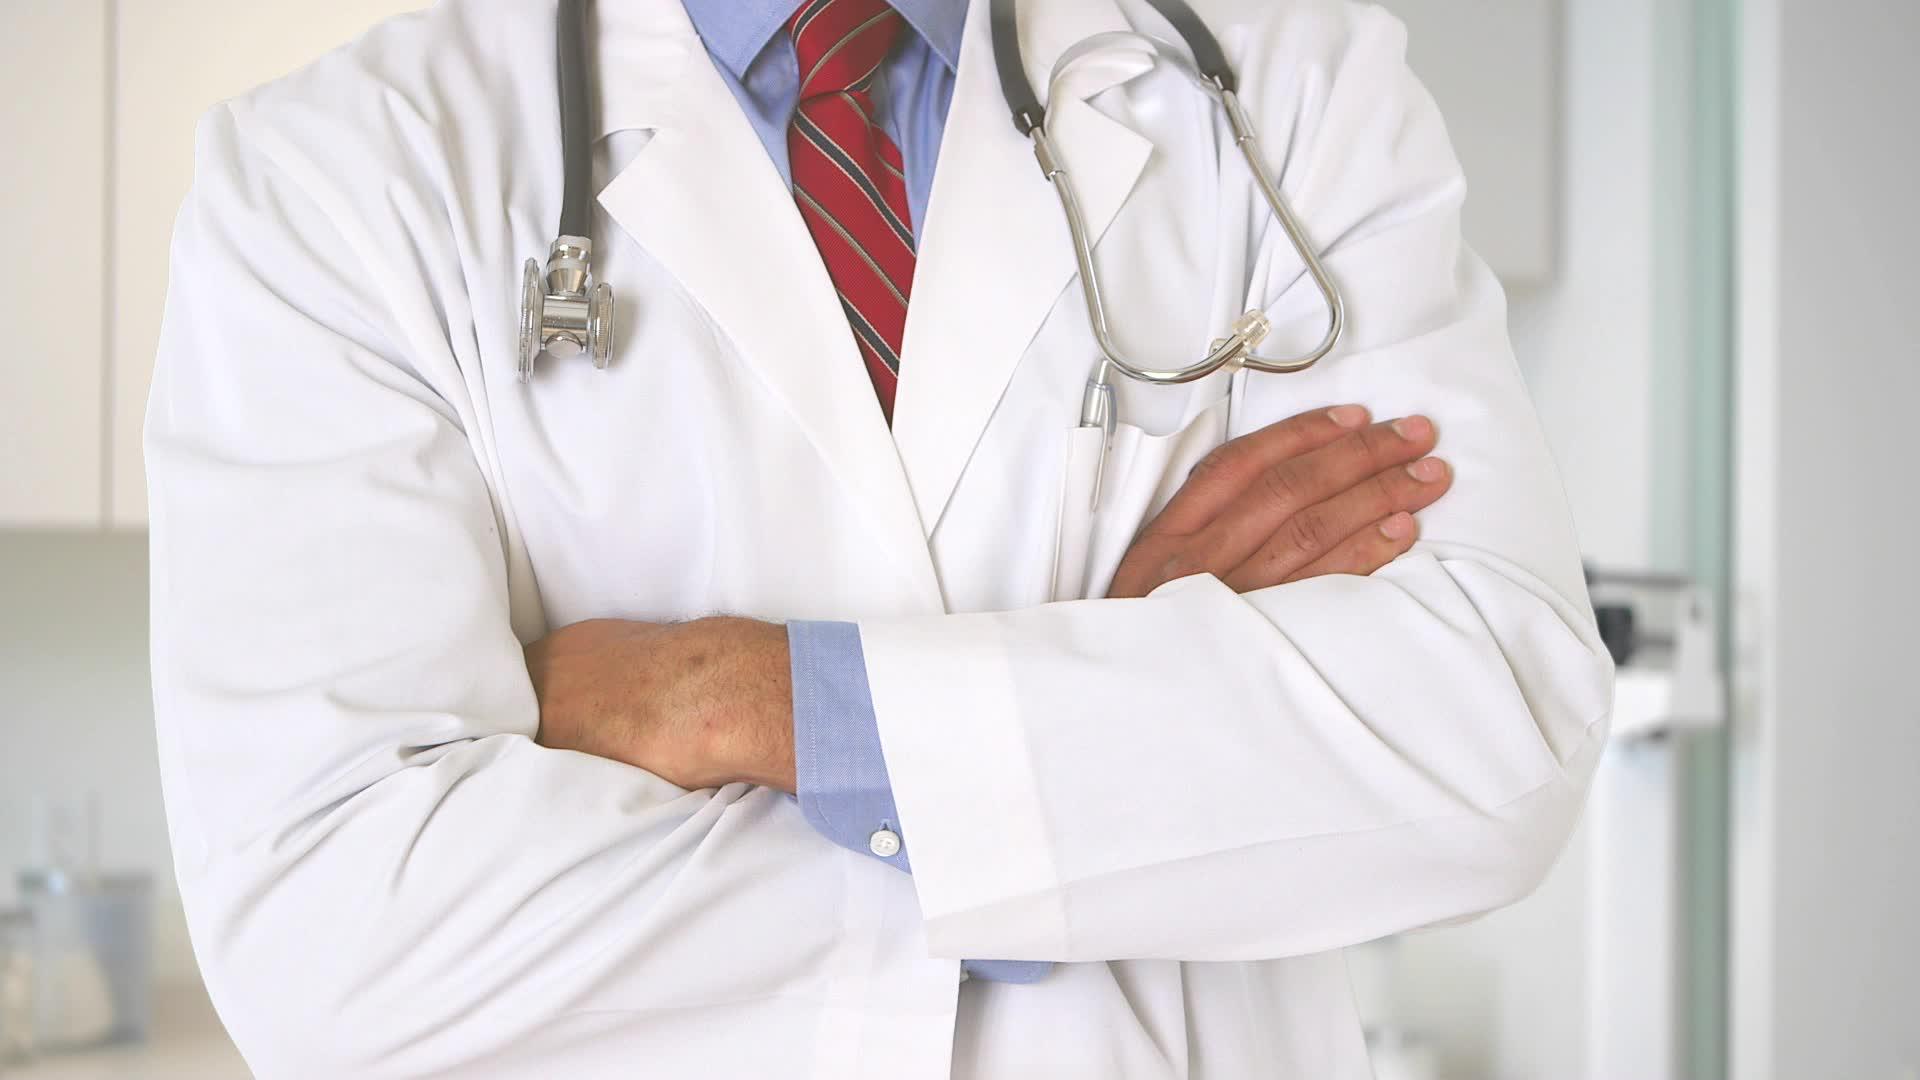 close-male-doctor-stethoscope-footage-011965185_prevstill